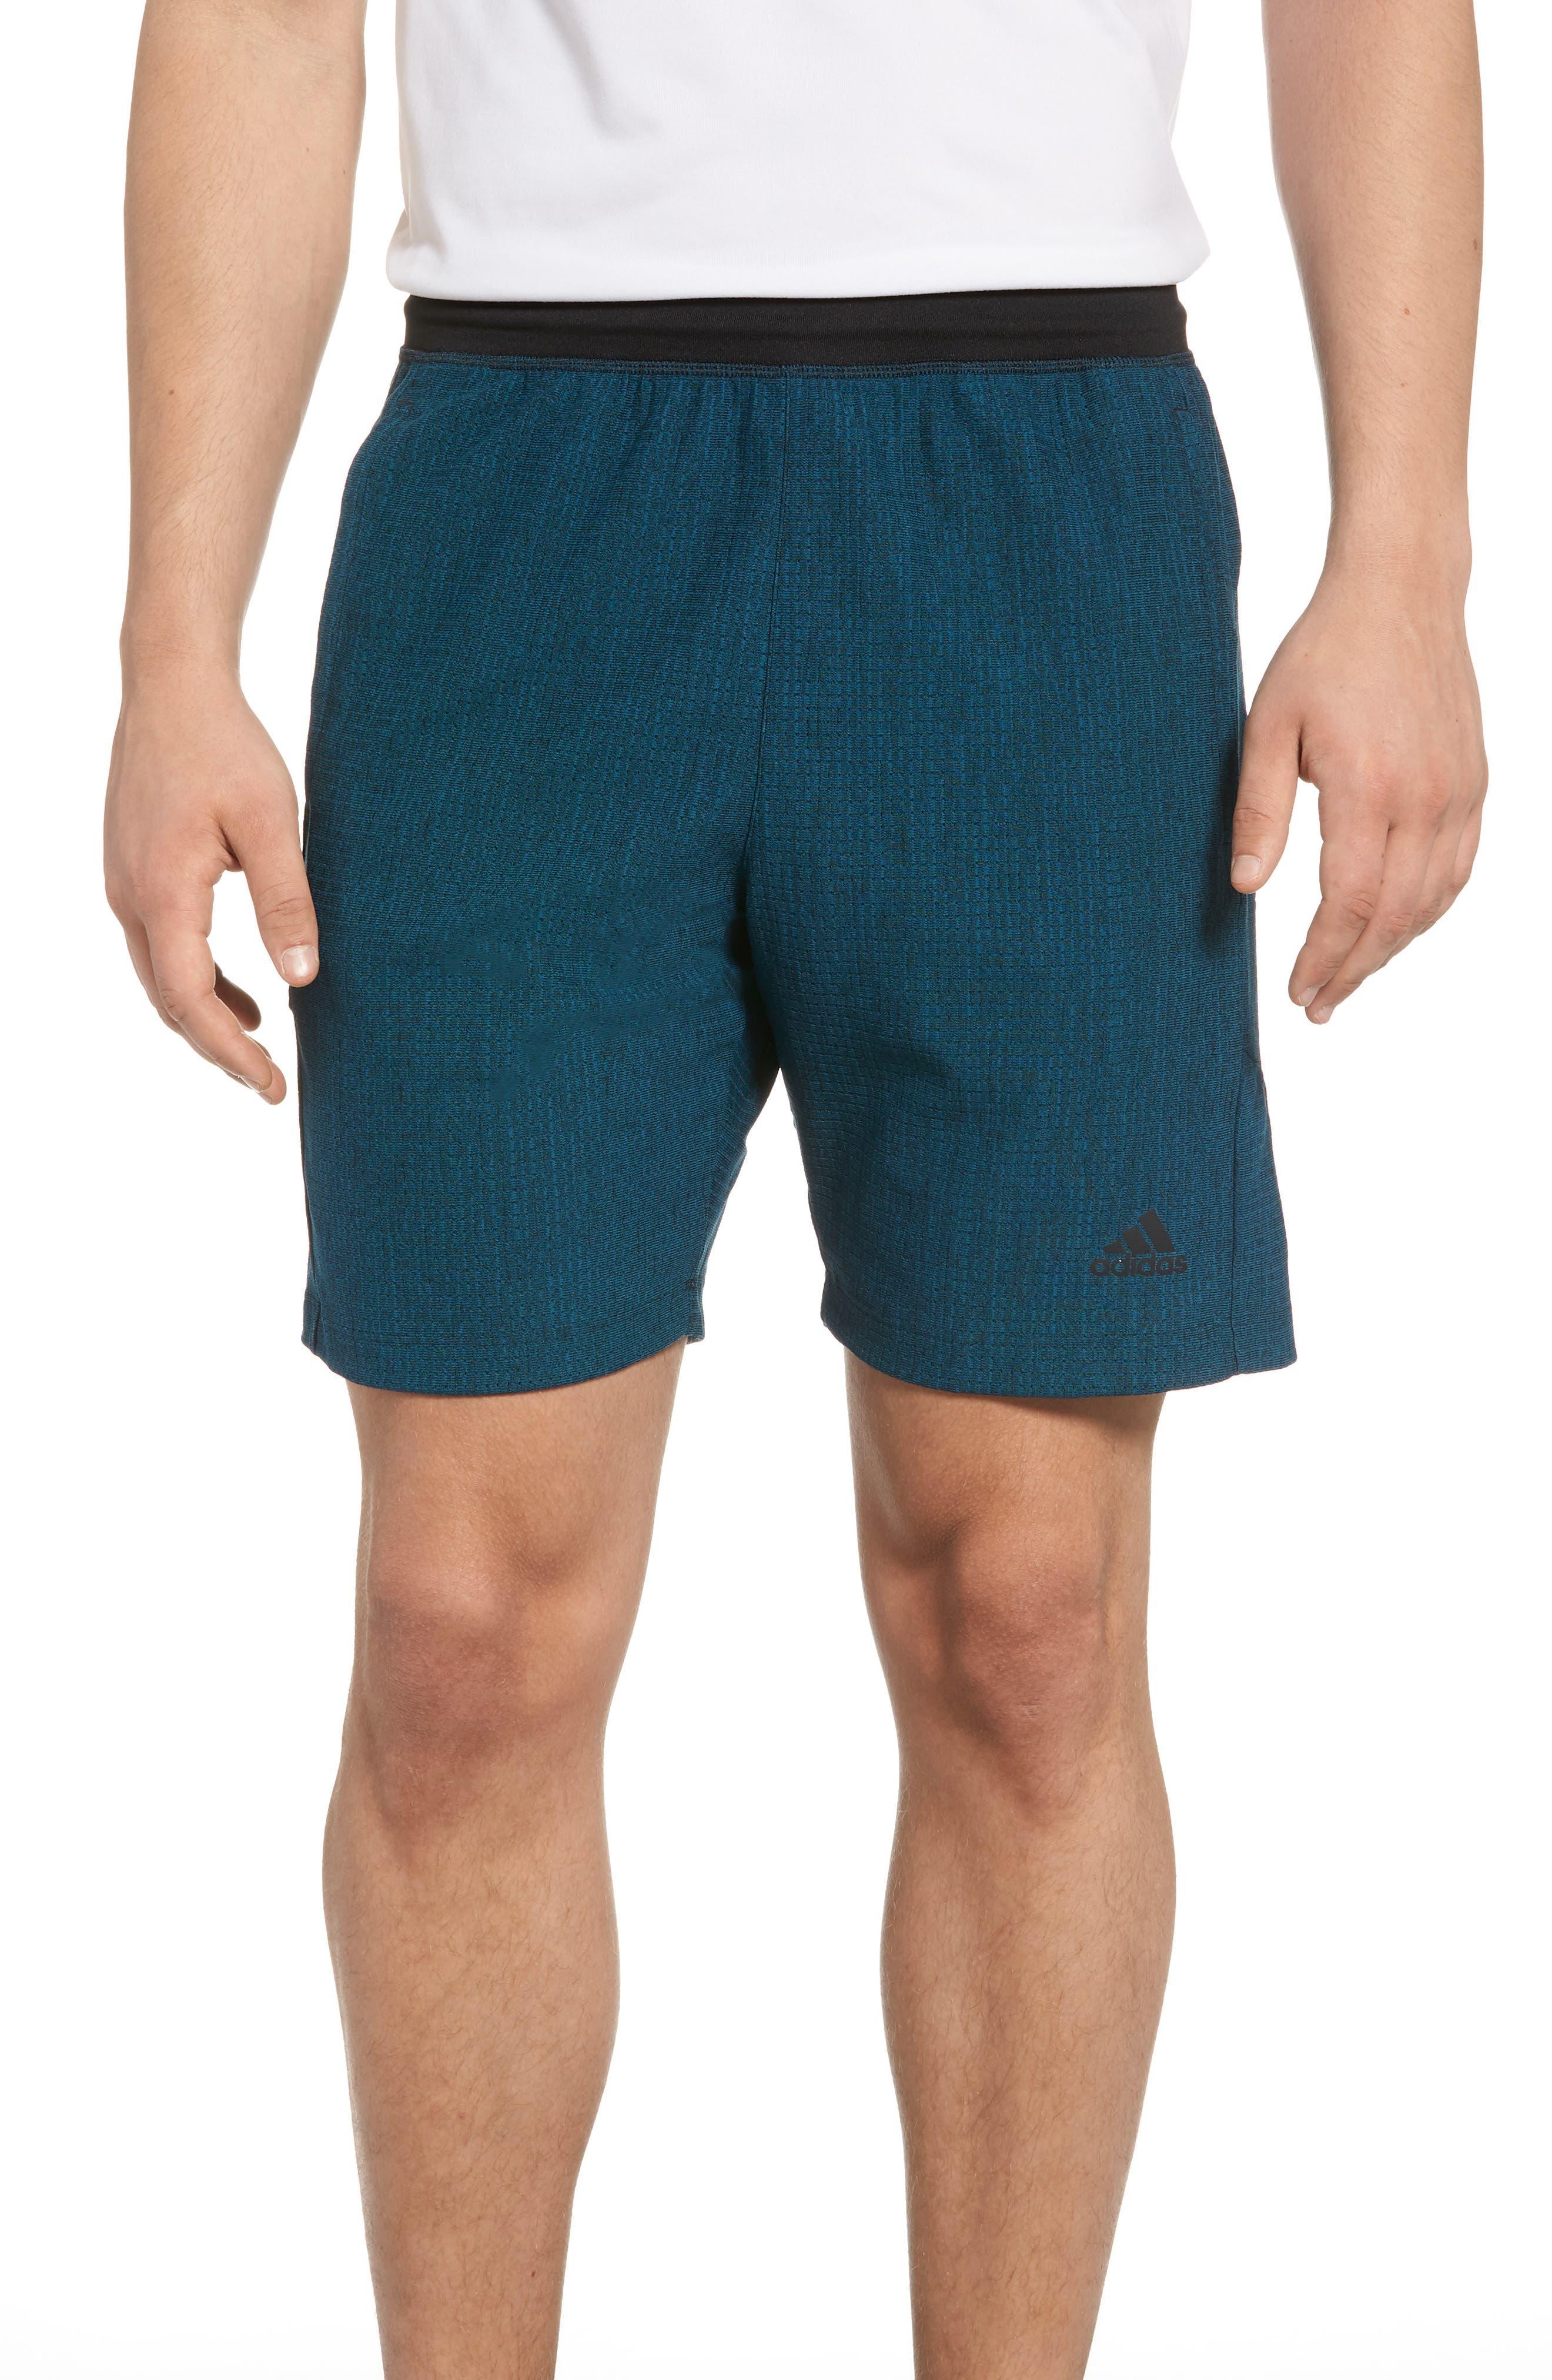 Speedbreaker Shorts,                             Main thumbnail 1, color,                             Real Teal